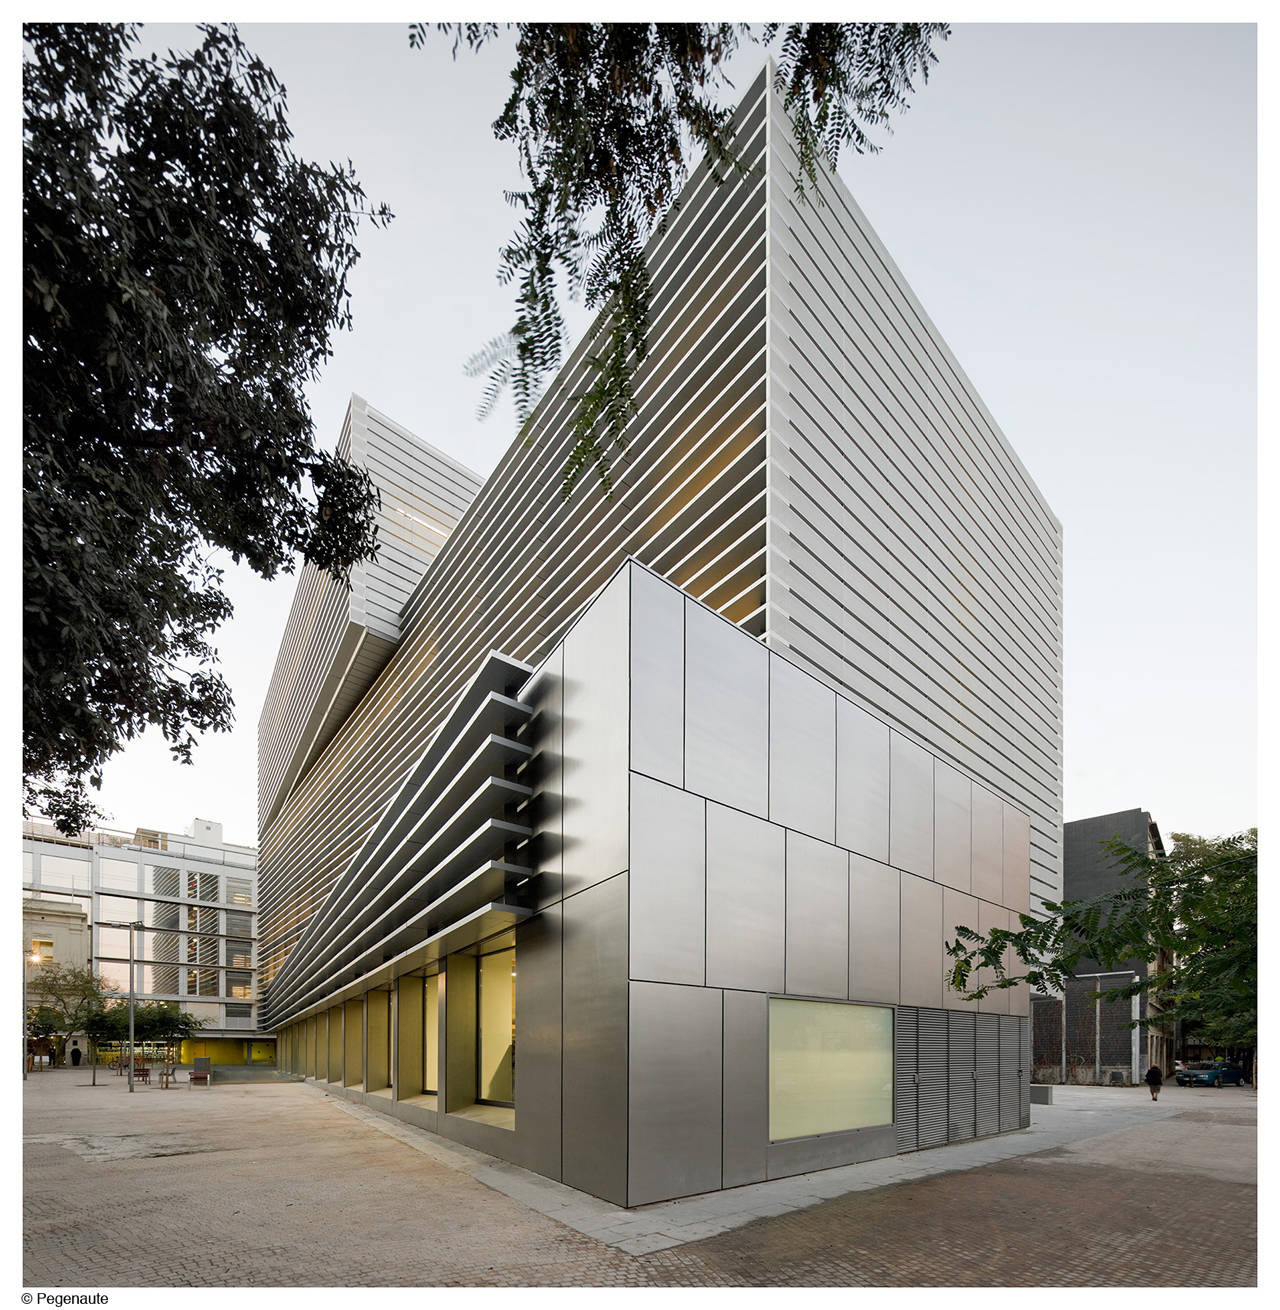 Social Security Administration Building In Barcelona / BCQ Arquitectura, © Pedro Pegenaute